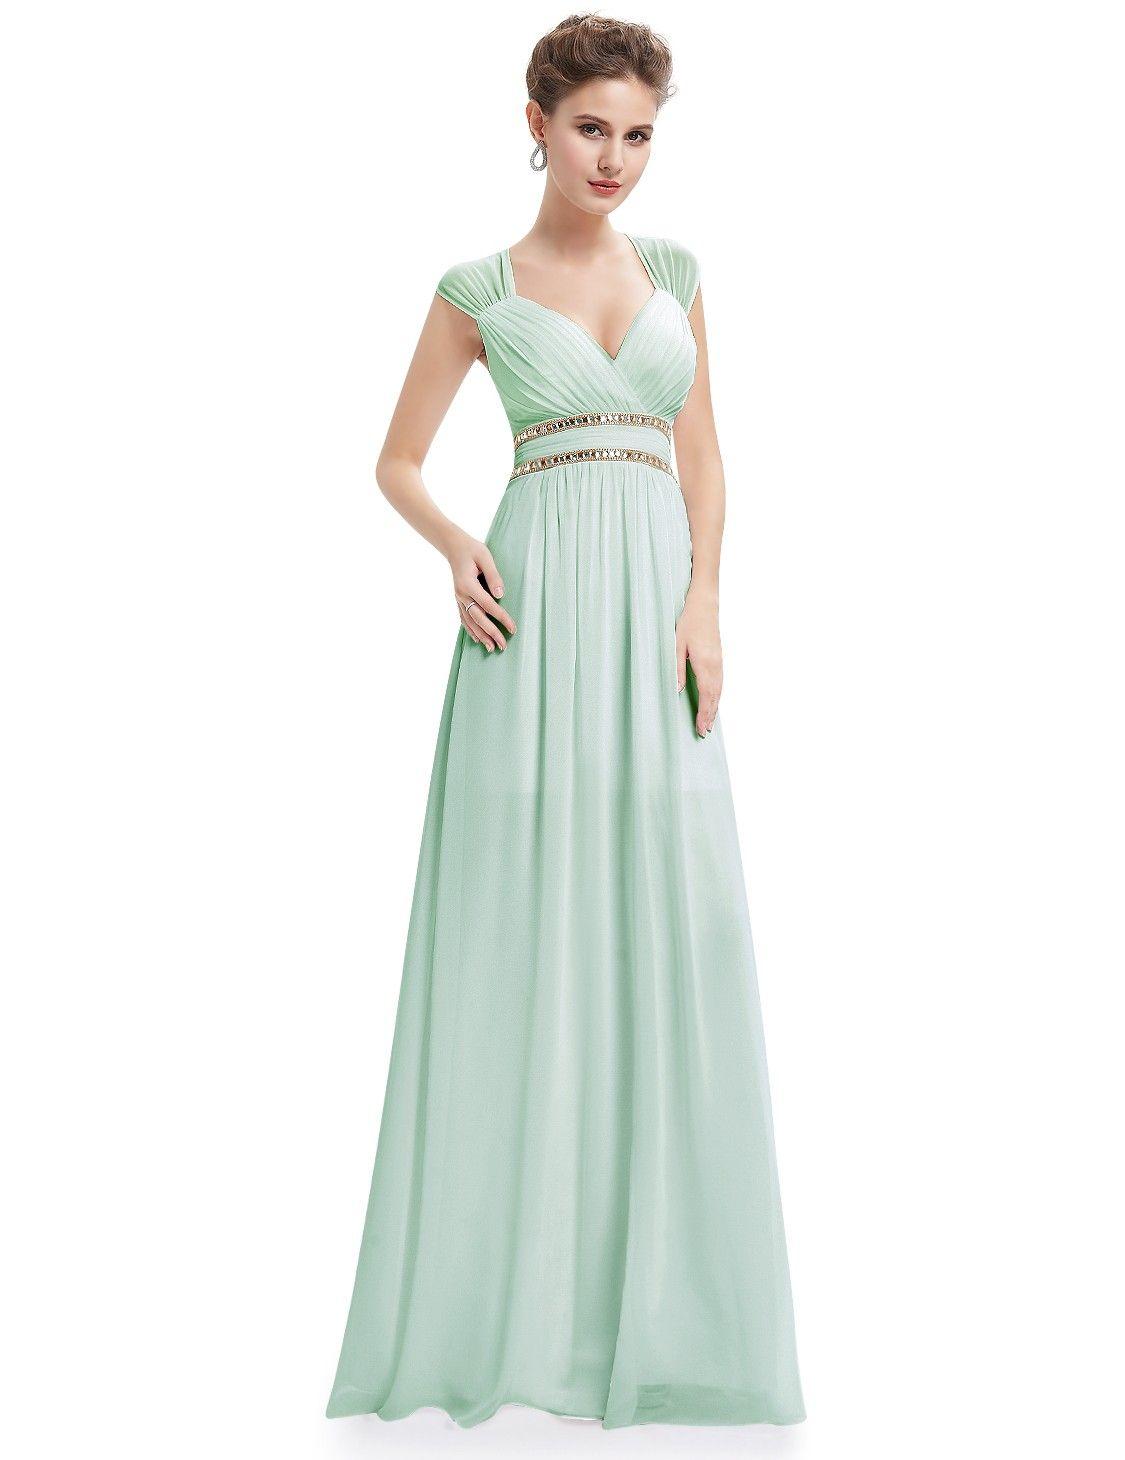 Mint grünes empire abendkleid damenmode alle trends im mode